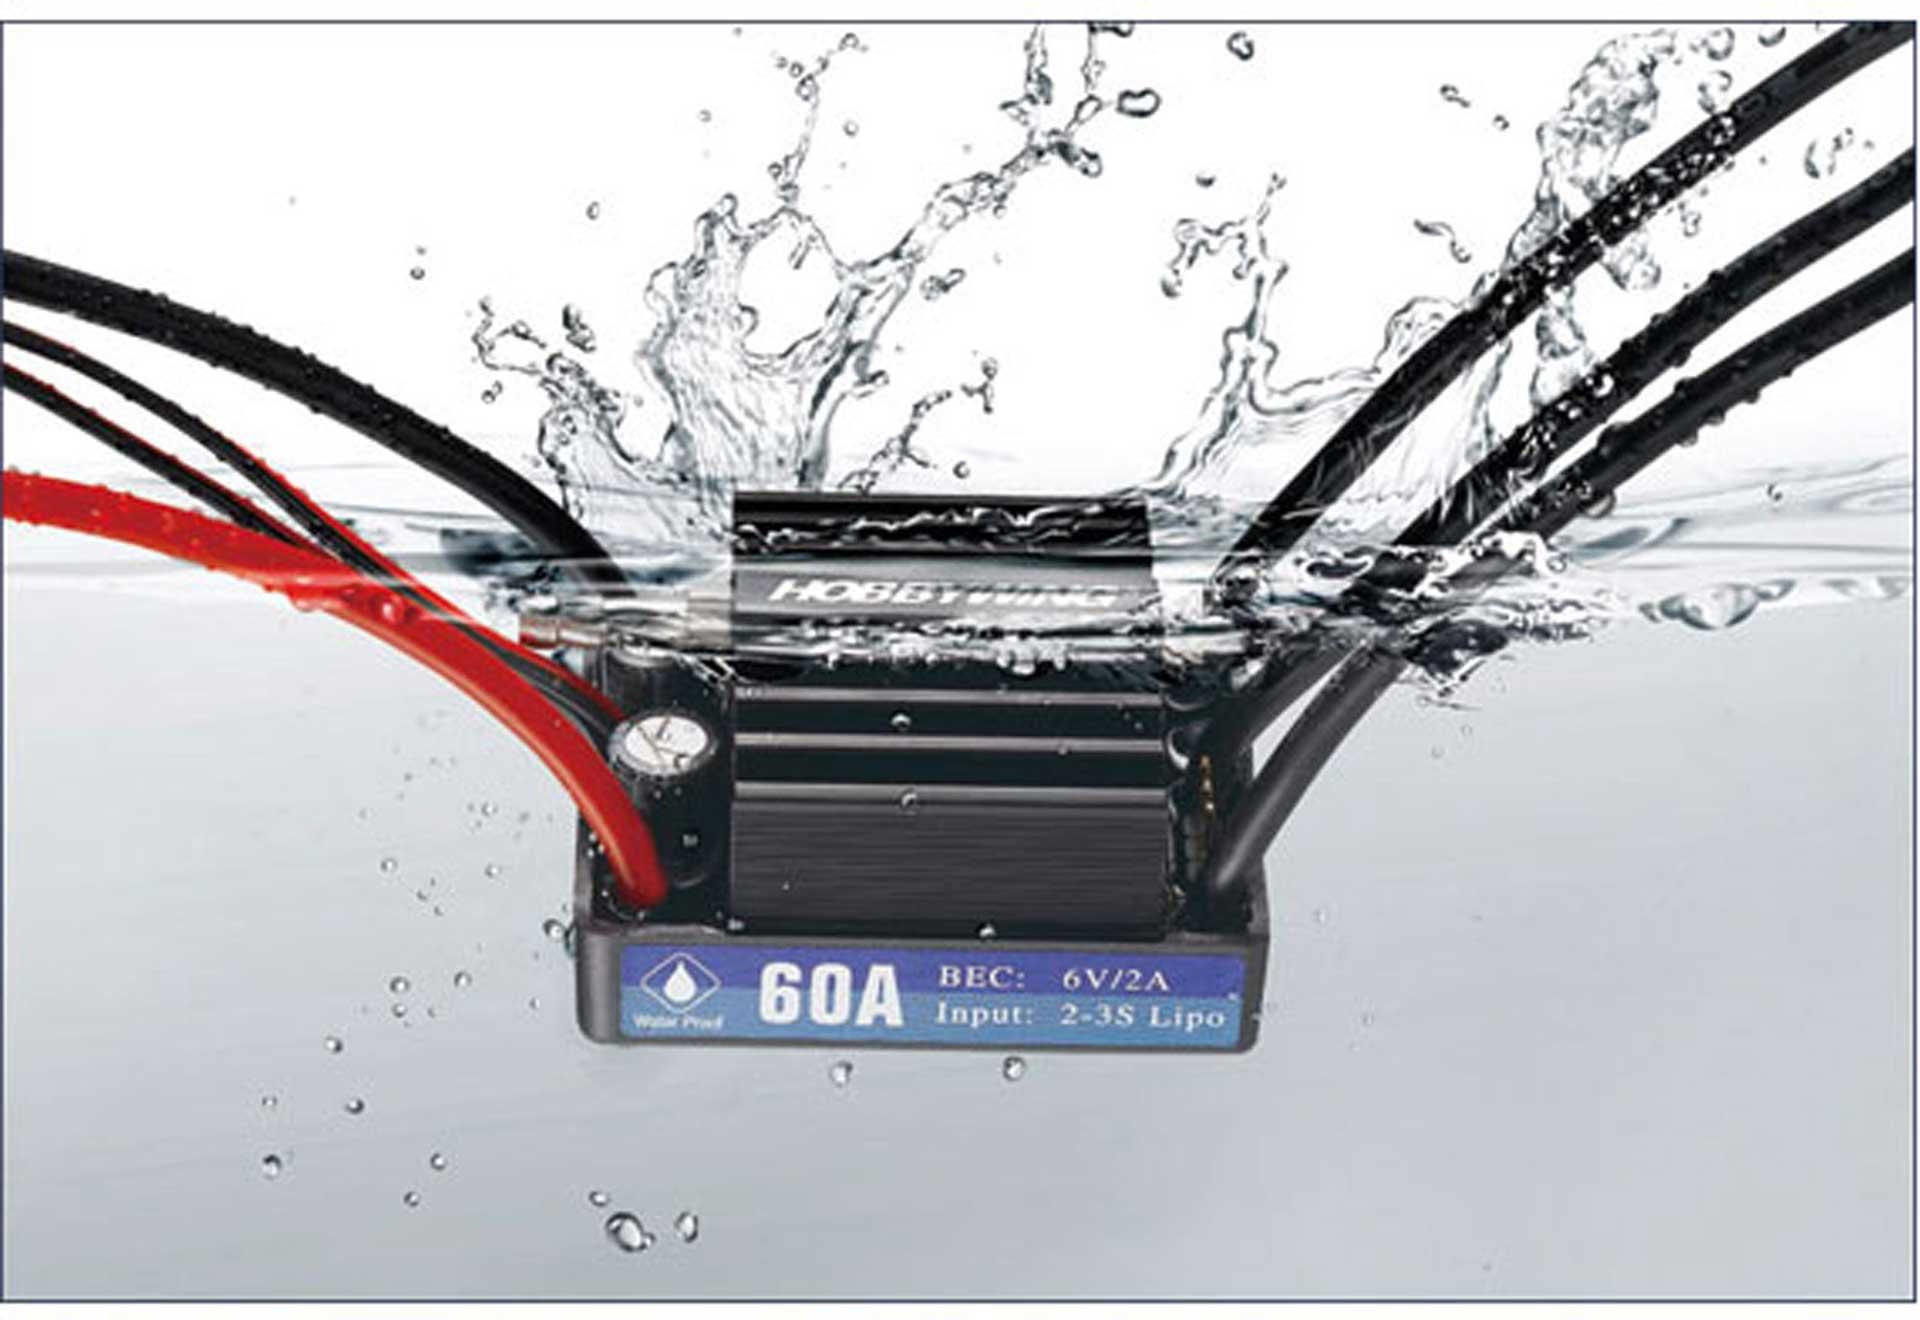 HOBBYWING SEAKING 60A V3.1 SBEC BRUSHLESS REGLER